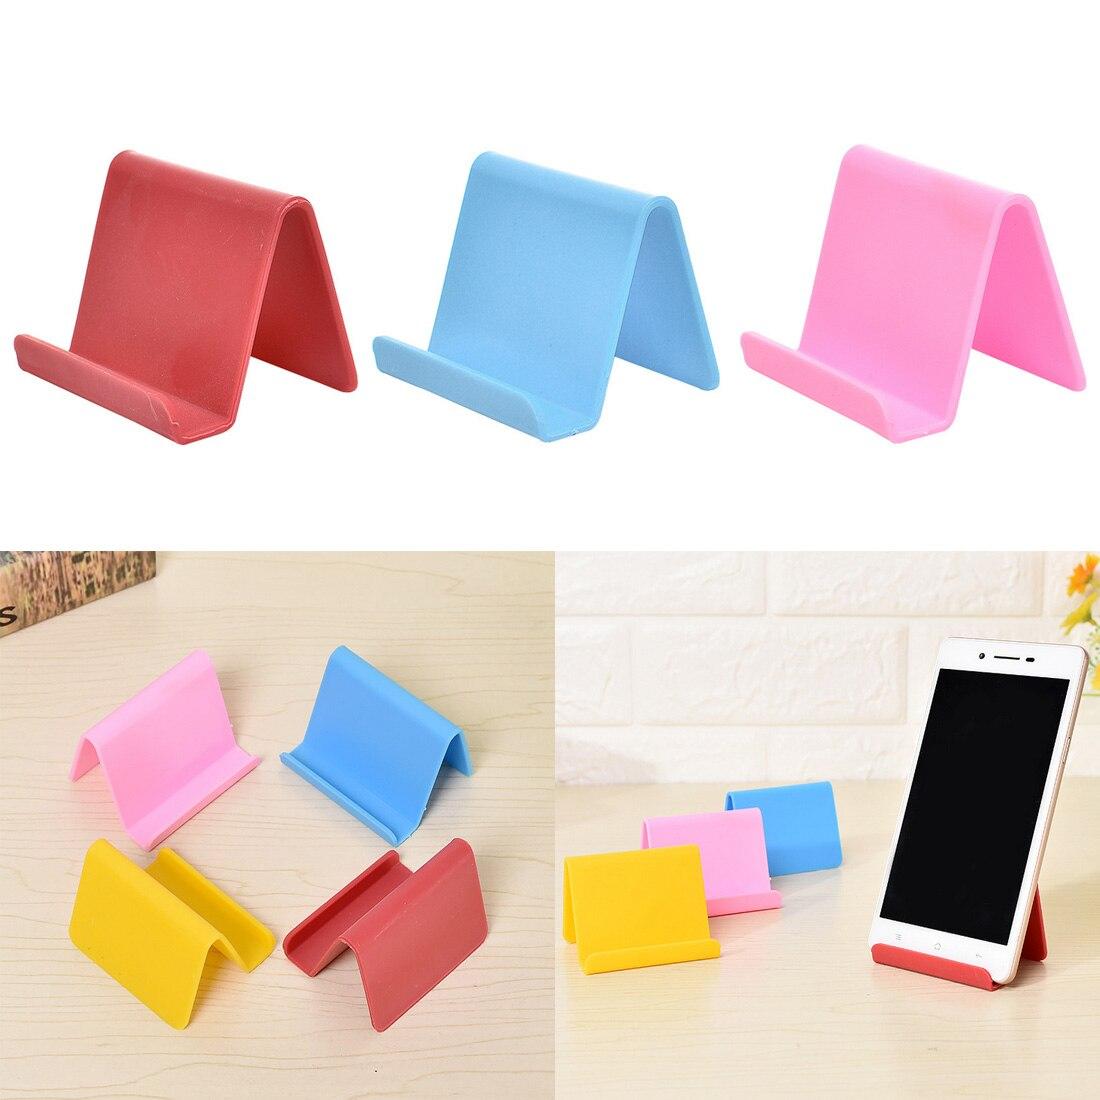 Candy Mini Portable Fixed Holder Mobile Phone  Home Supplies Organizador Movable Shelf Organizer